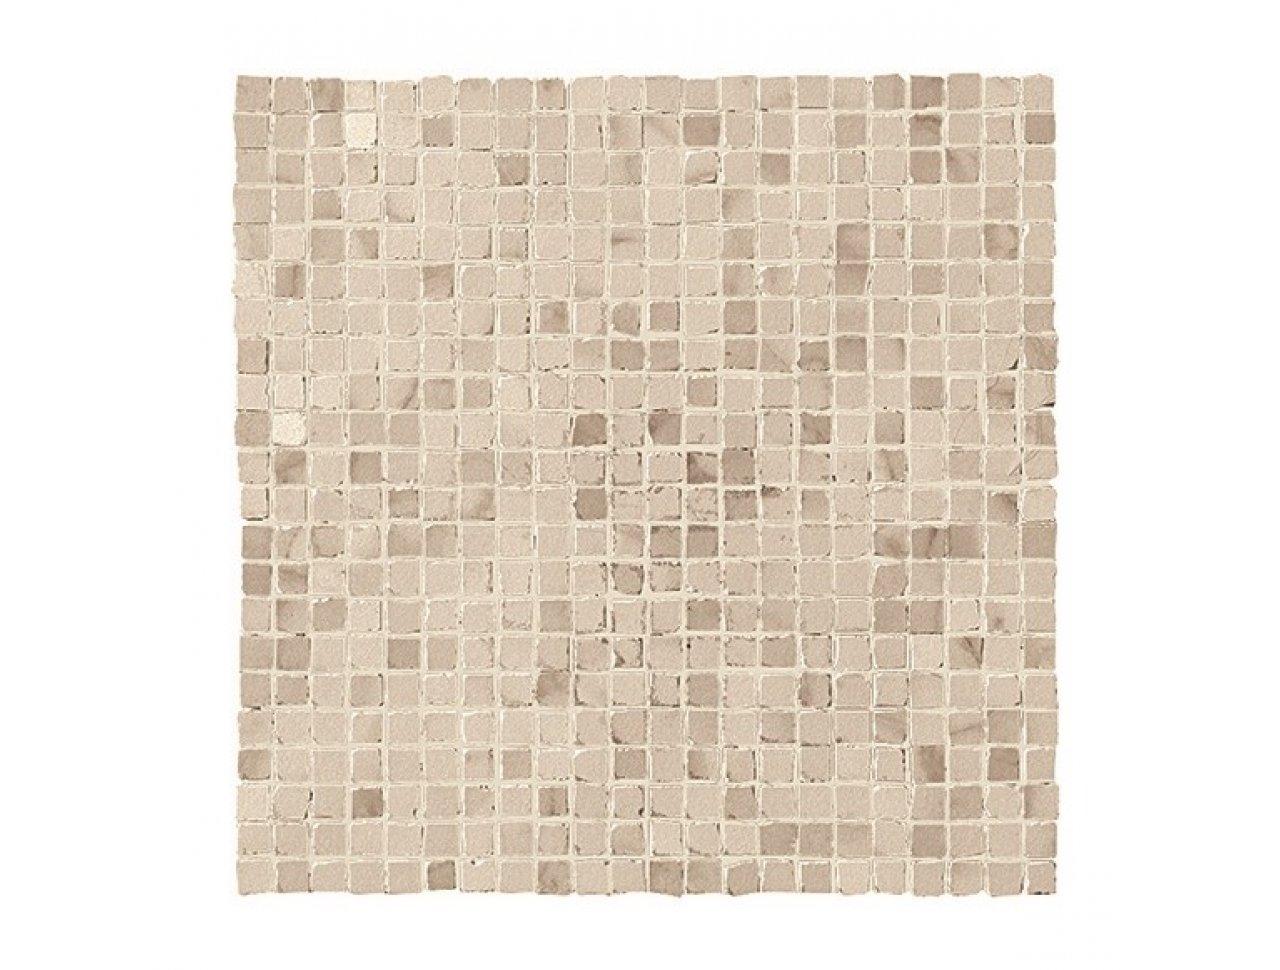 Мозаика FAP Roma Pietra Micromosaico 30.5 x 30.5 см, Арт. fLYS